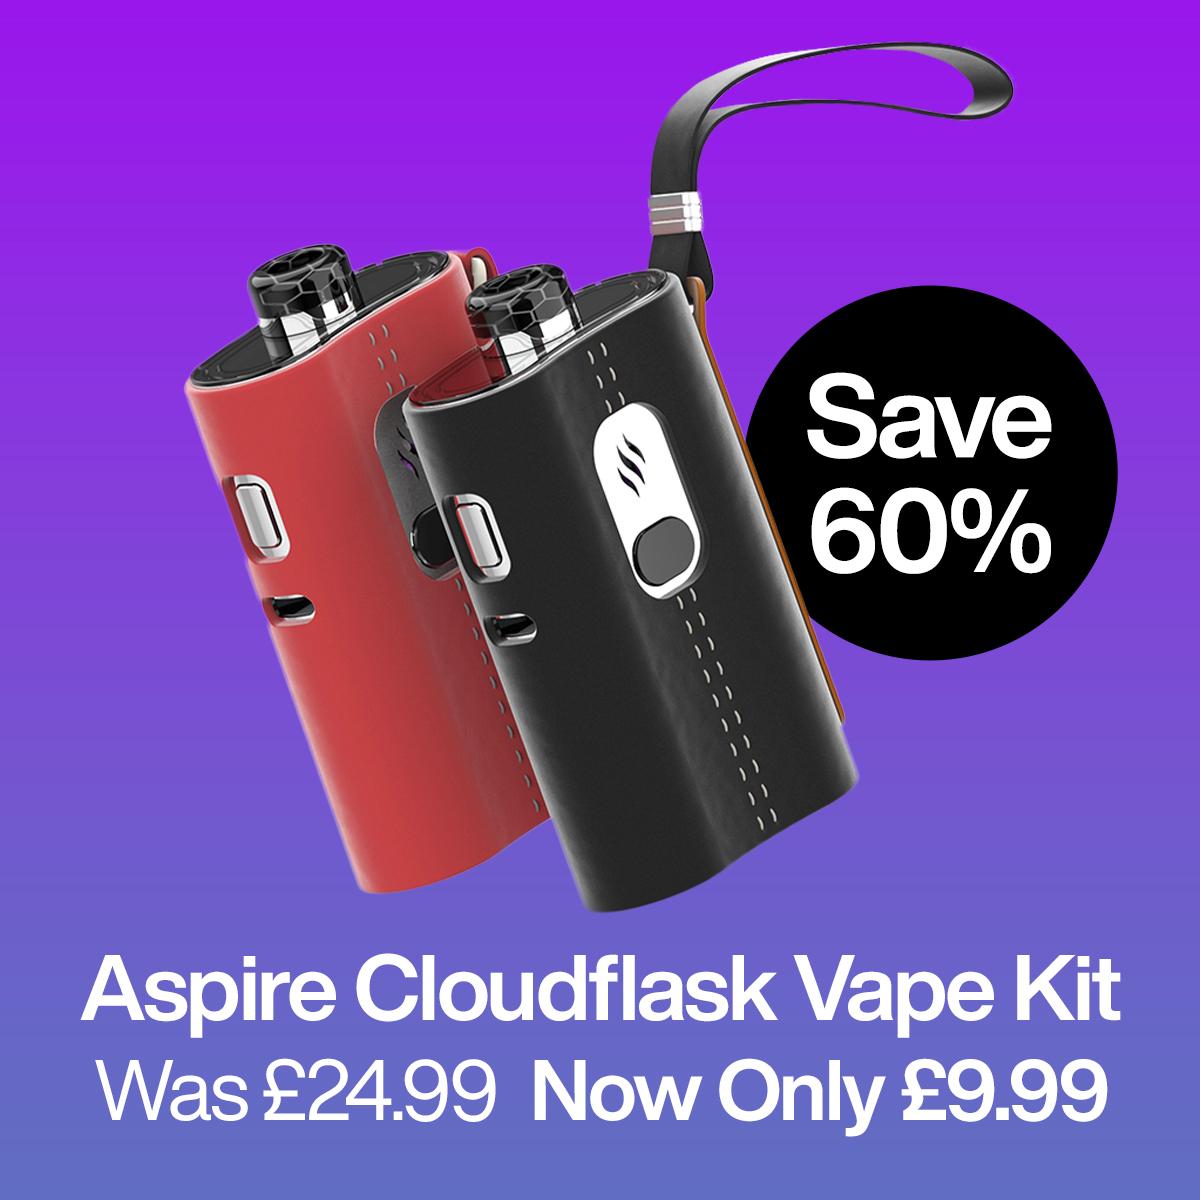 Aspire Cloudflask Pod Kit – £9.99